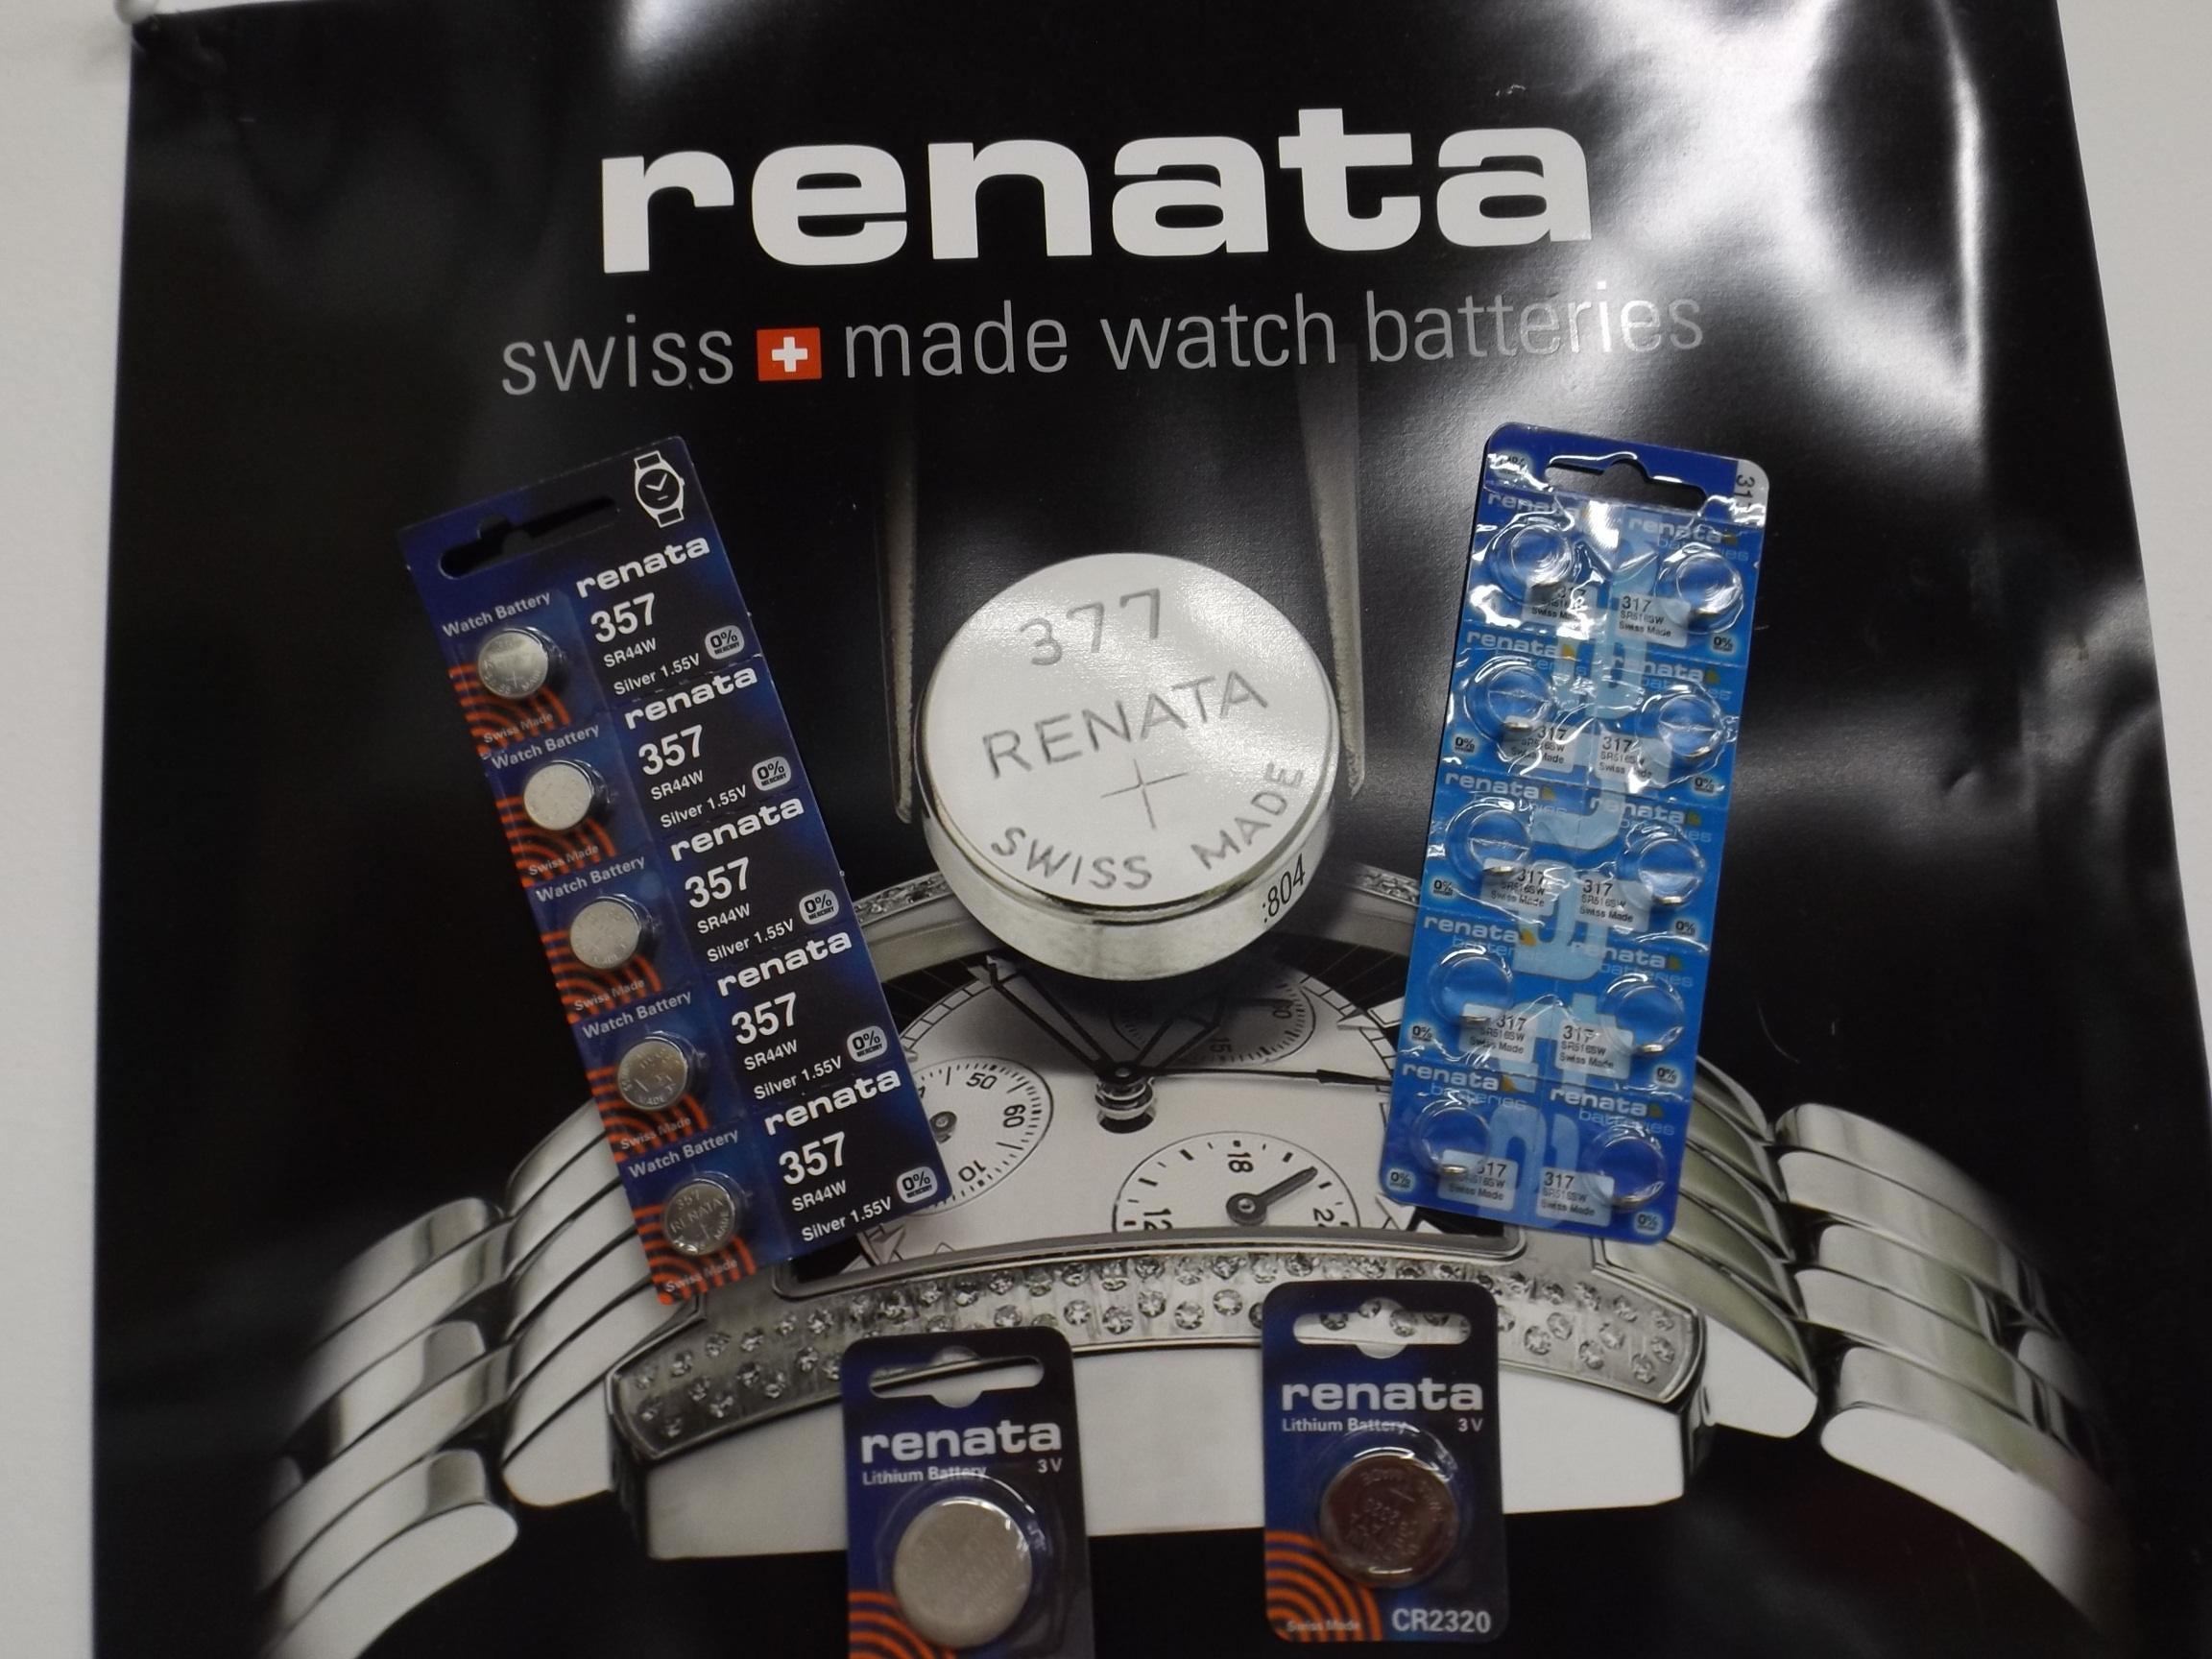 REN391 Renata Watch Batteries Multipacks, sold by 5's